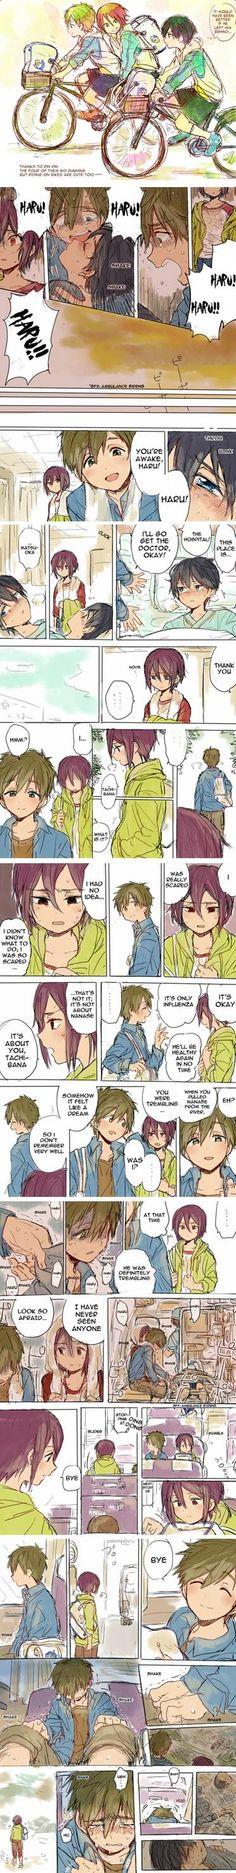 Free! Starting Days - Makoto / Haru / Rin